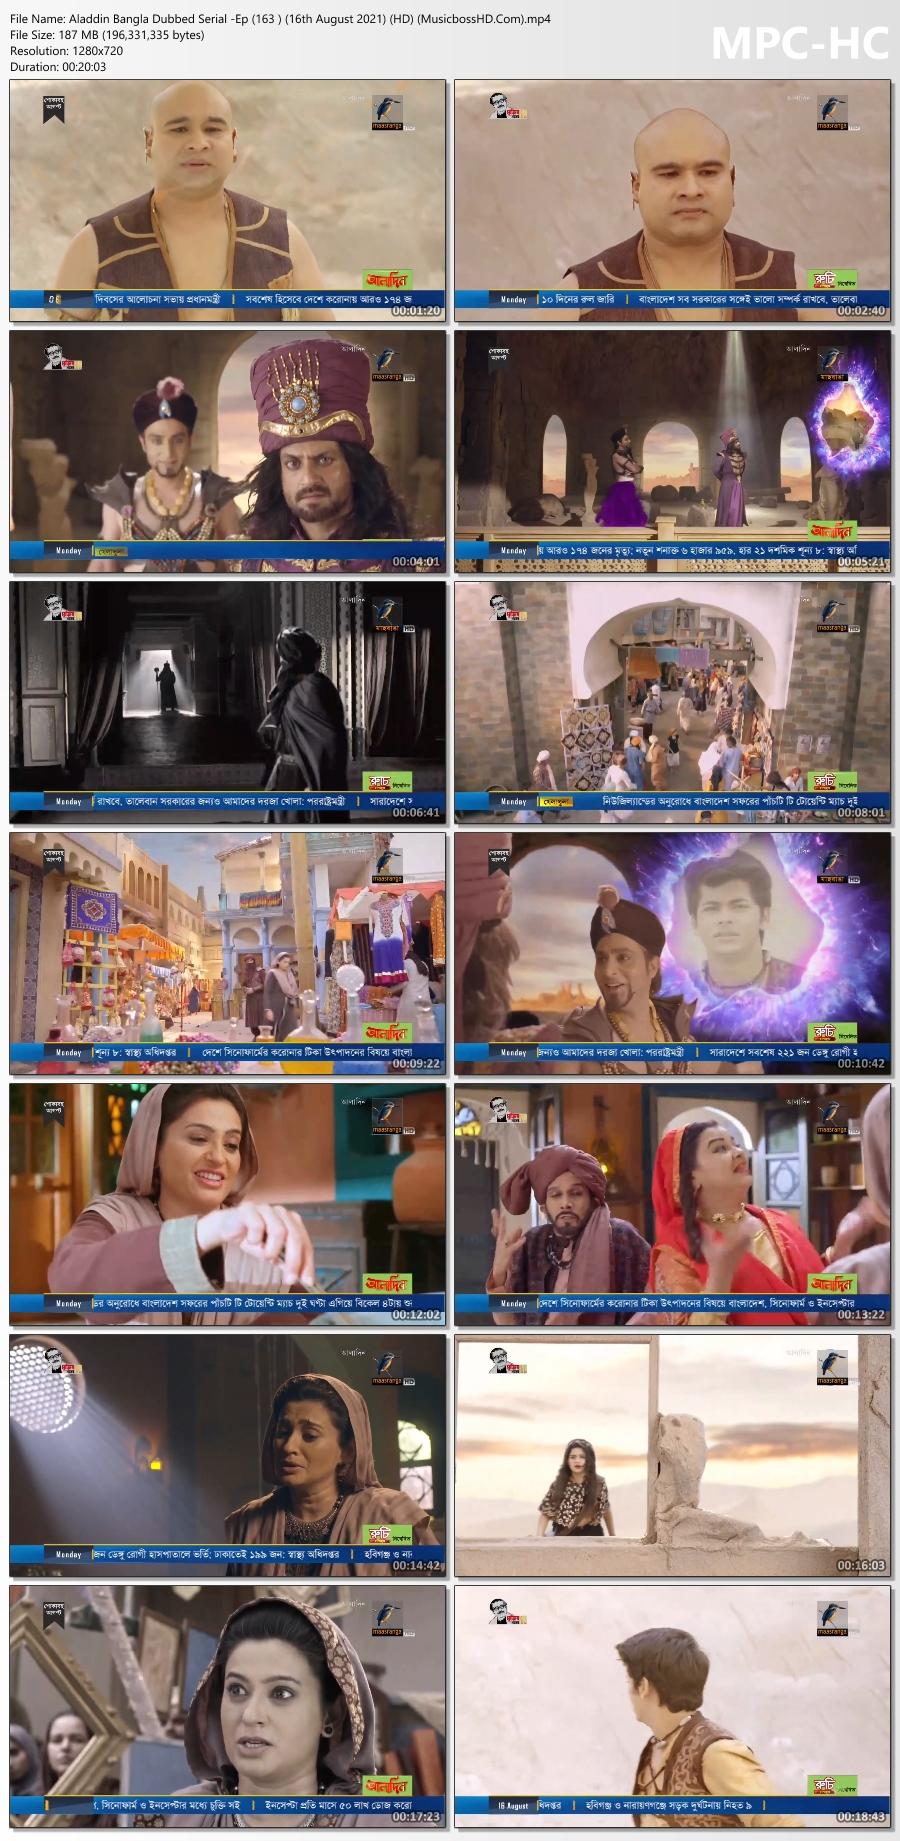 Aladdin-Bangla-Dubbed-Serial-Ep-163-16th-August-2021-HD-Musicboss-HD-Com-mp4-thumbs